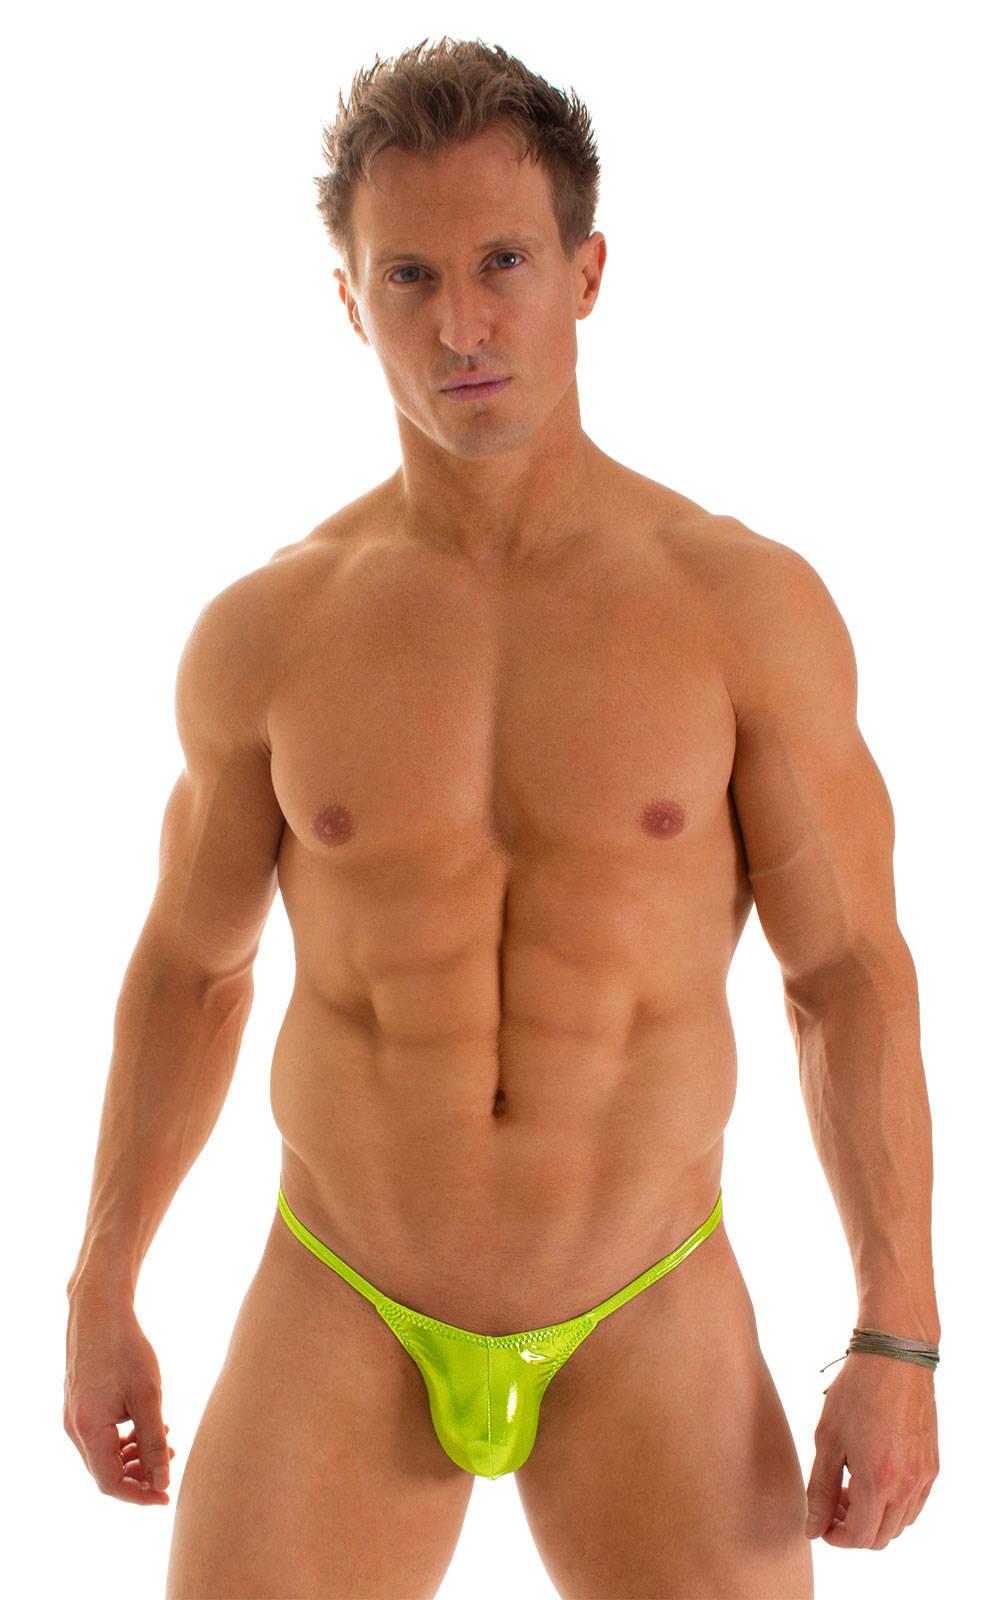 Micro Pouch - Puckered Back - Rio Bikini in Ice Karma Lemon-Line 1